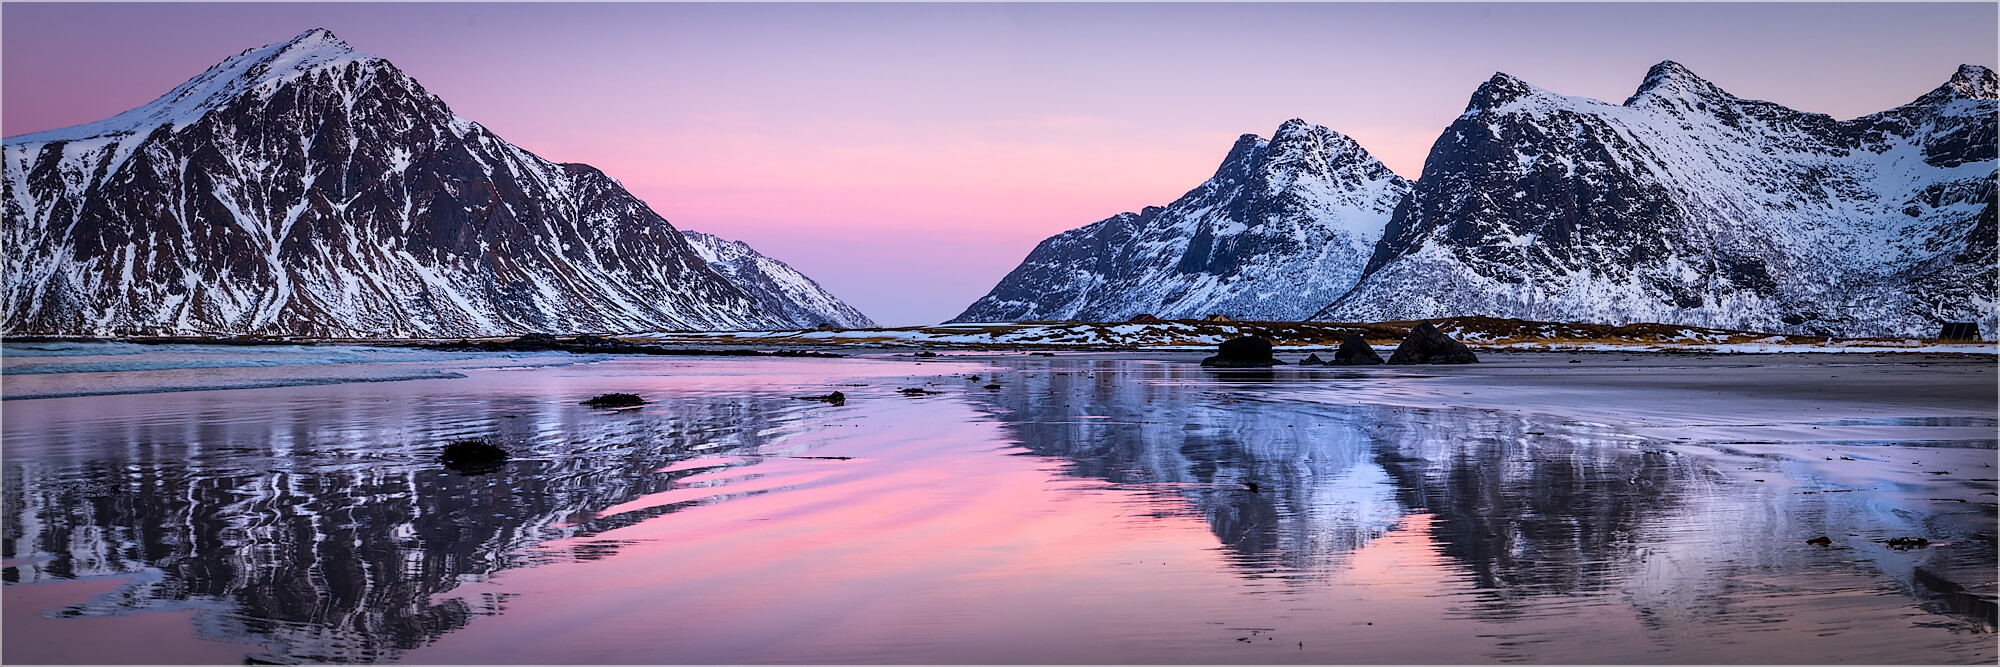 Panoramabild Polarwinter am Strand Lofoten Norwegen